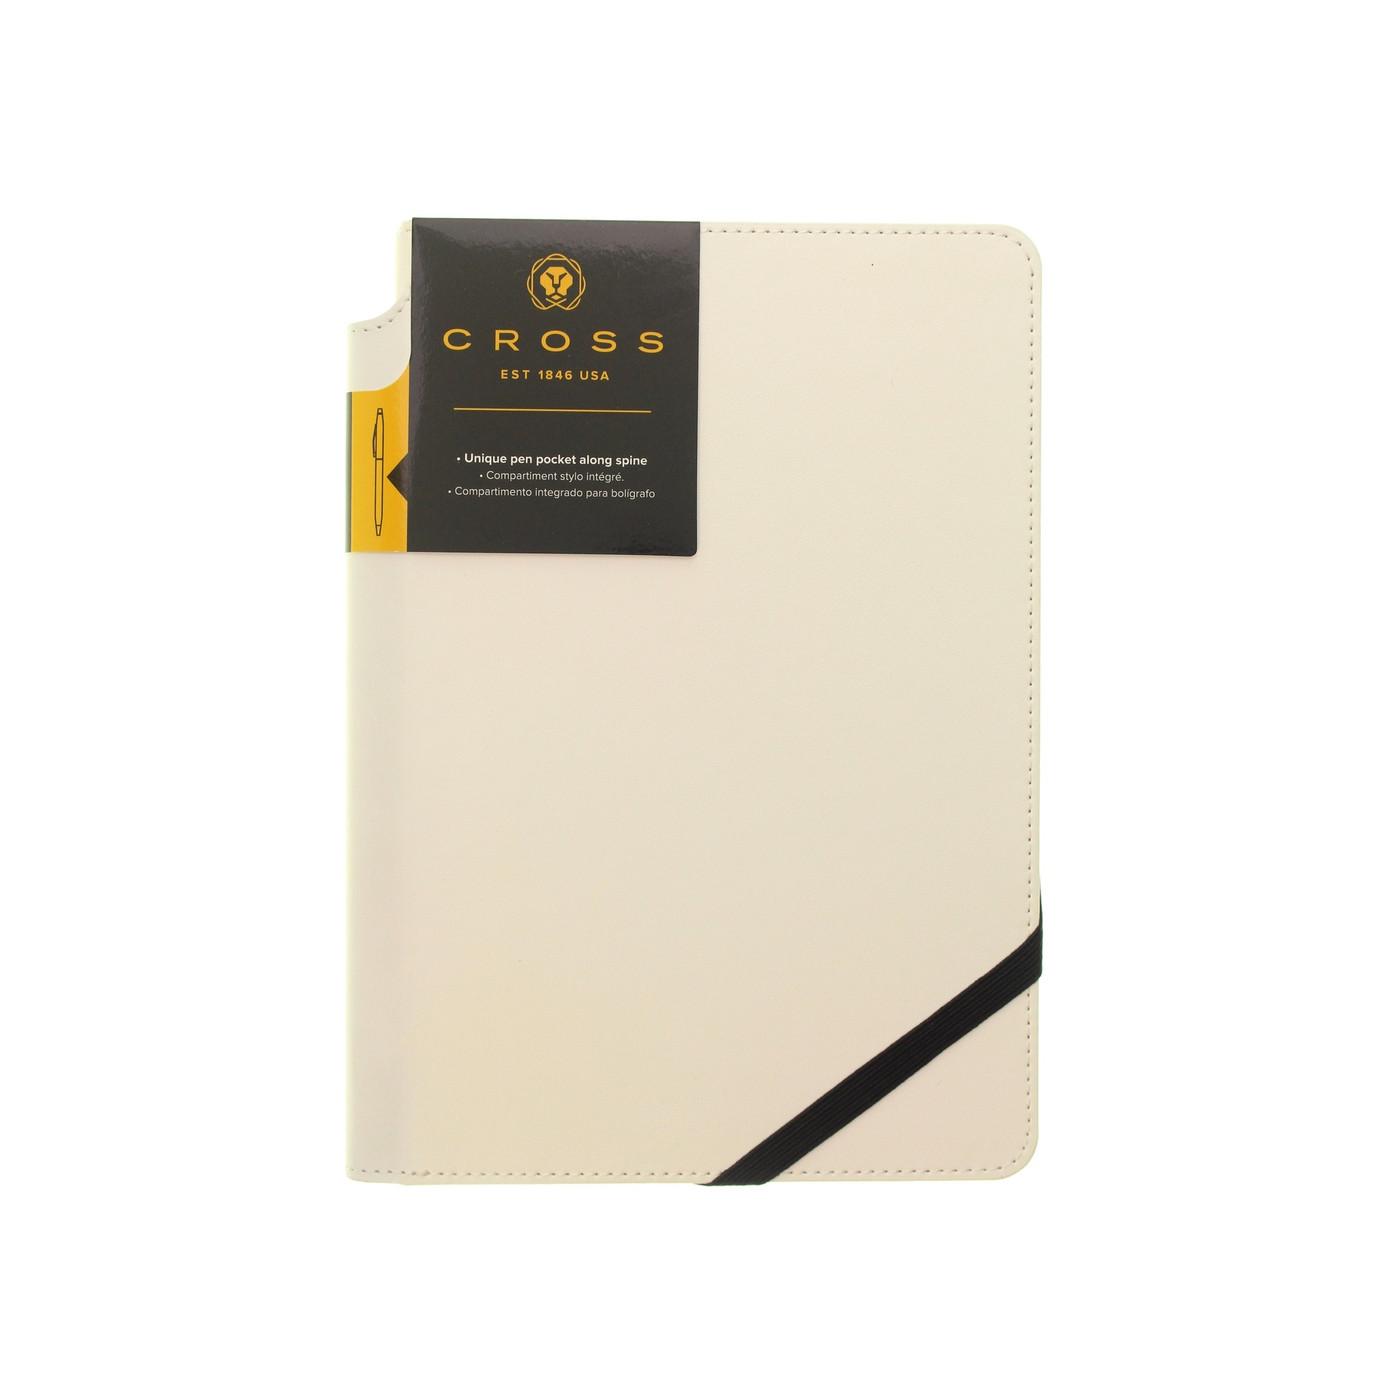 Cross notebook - A5 - LINED